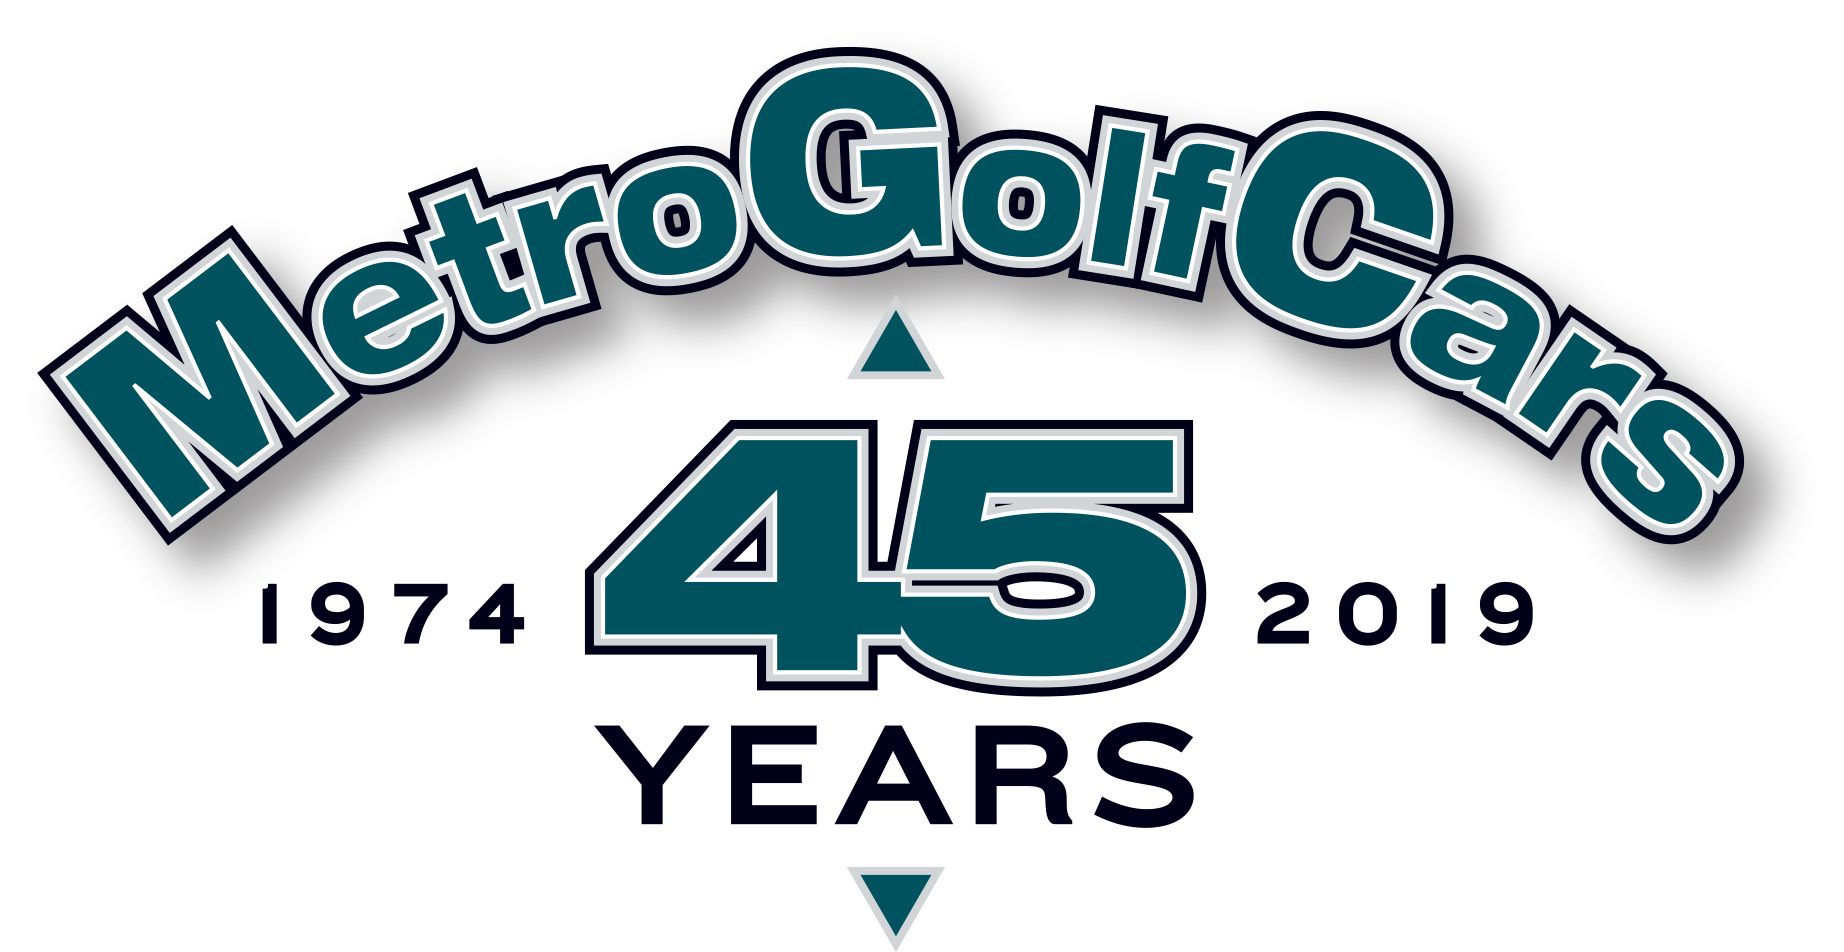 Golf Cart Parts Fort Worth on tucson golf, seattle golf, hawaii golf, iowa golf, texas golf, michigan golf, boca raton golf, corpus christi golf, garland golf, wisconsin golf, georgia golf, miami golf, santa barbara golf,